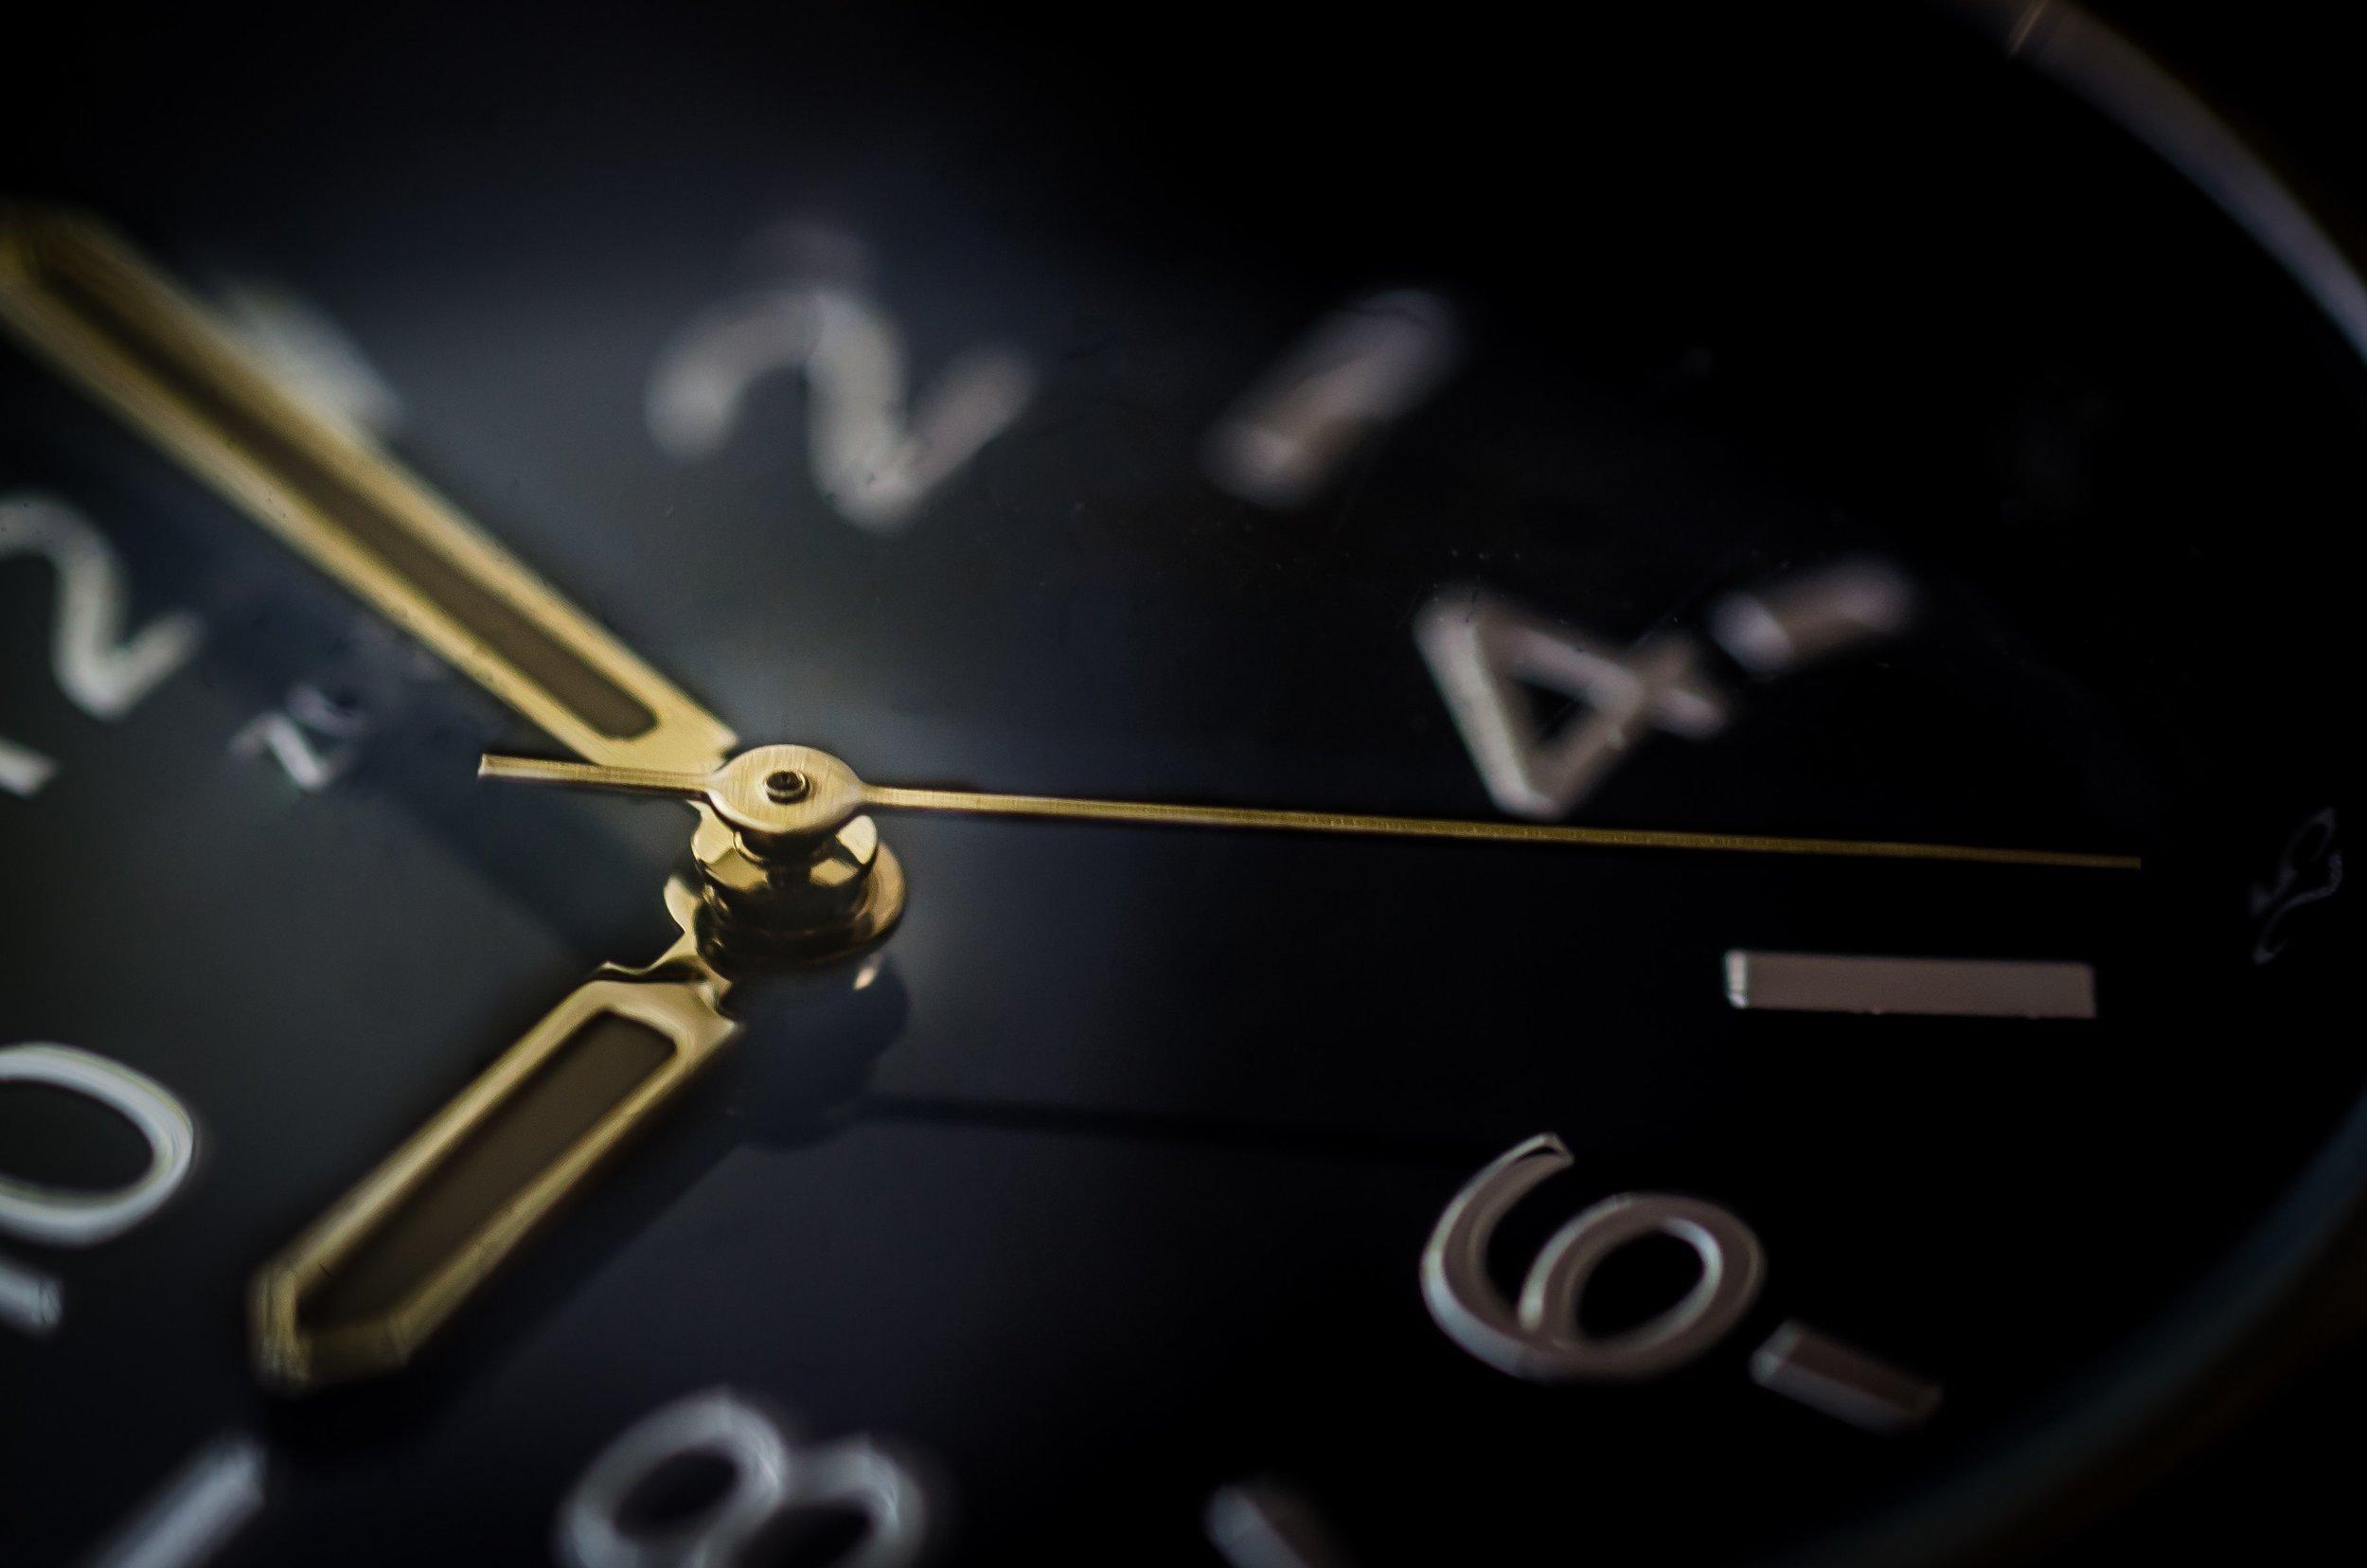 clock-hours-minutes-9352.jpg